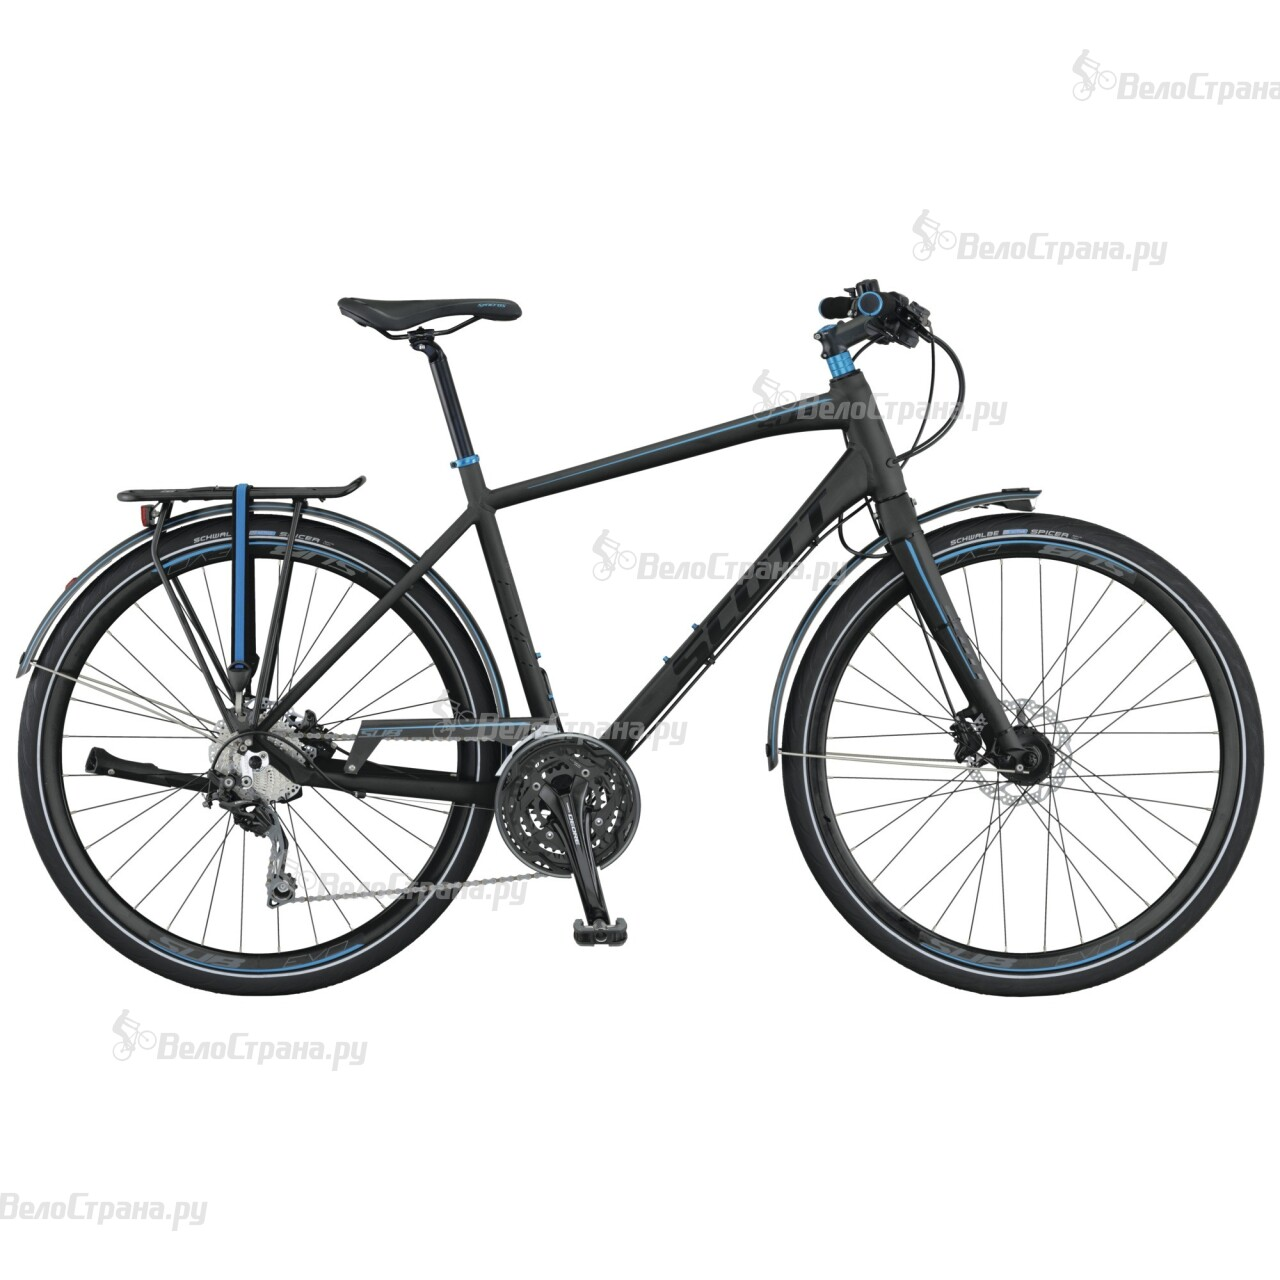 Велосипед Scott Sub Evo 30 (2015)